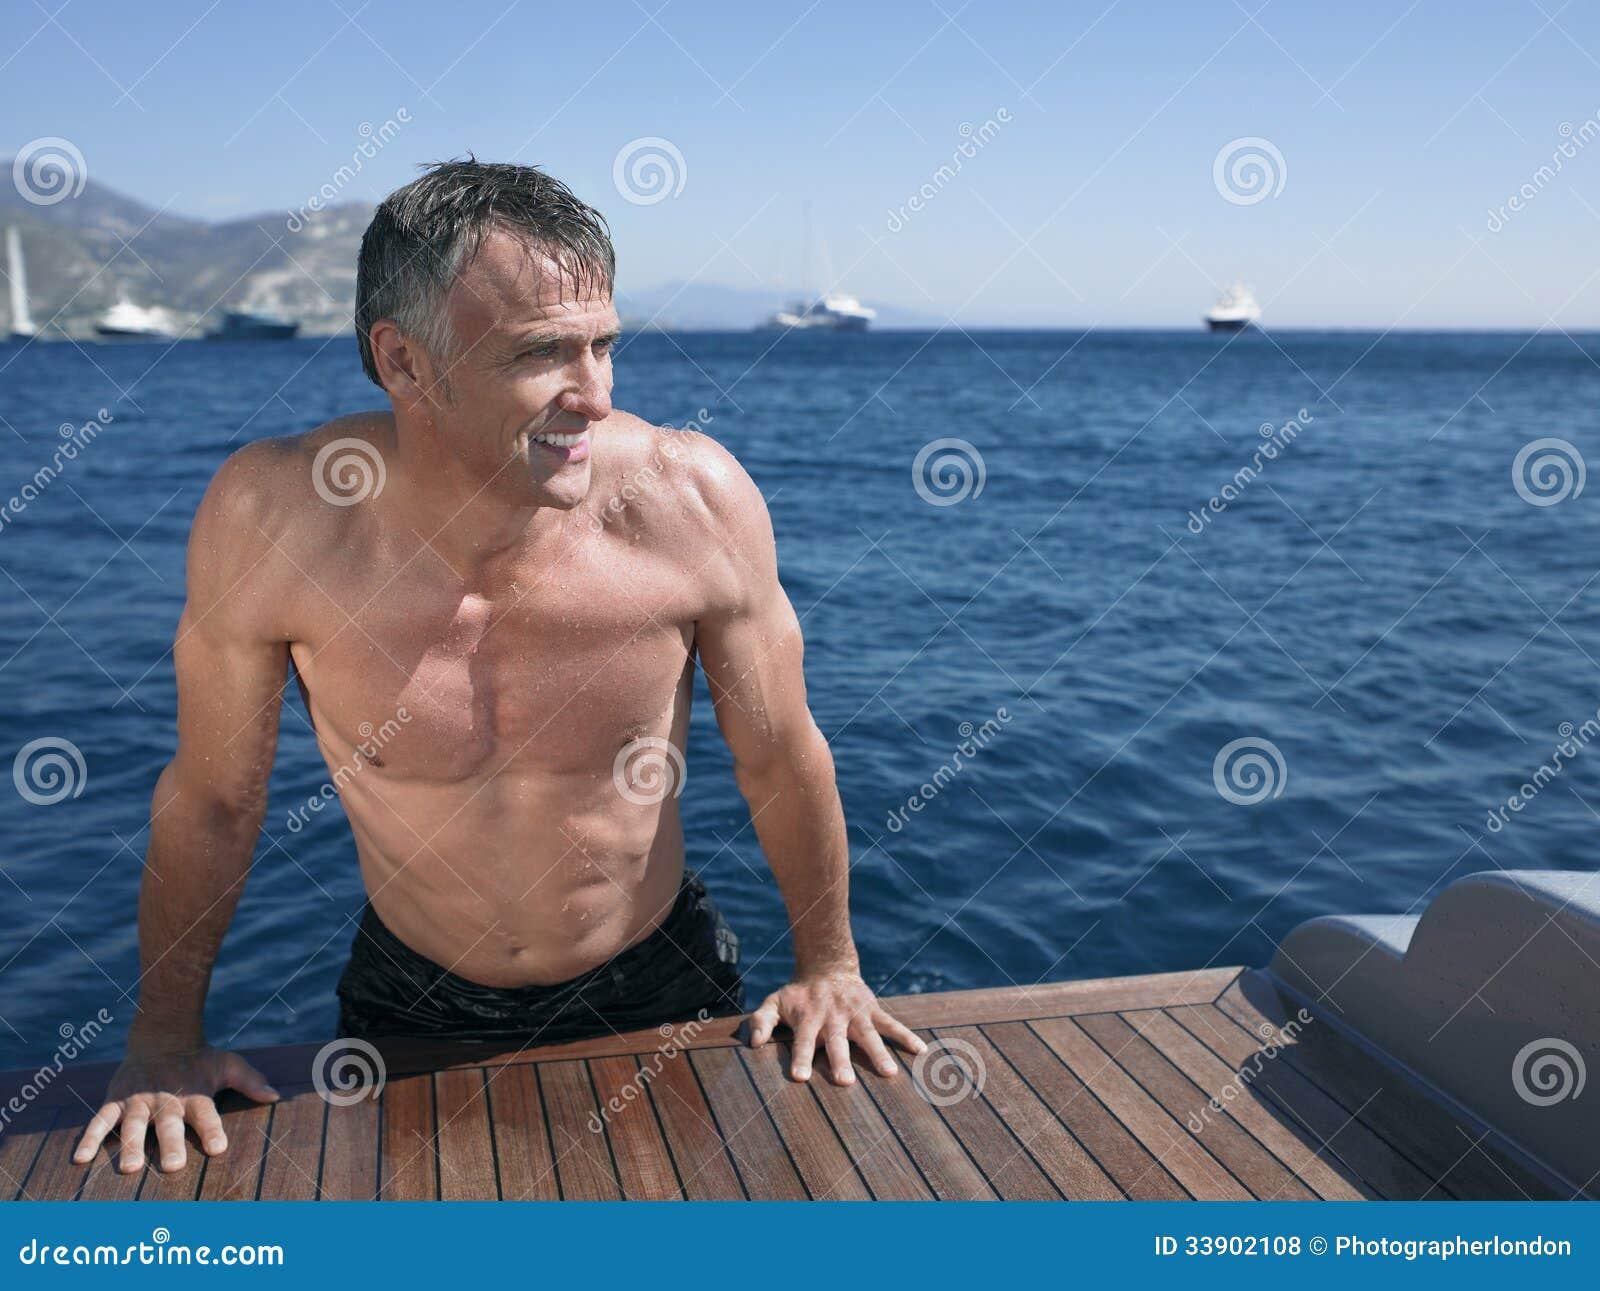 Fußboden Yacht ~ Mann der am rand des fußbodenbrettes der yacht sich lehnt stockfoto